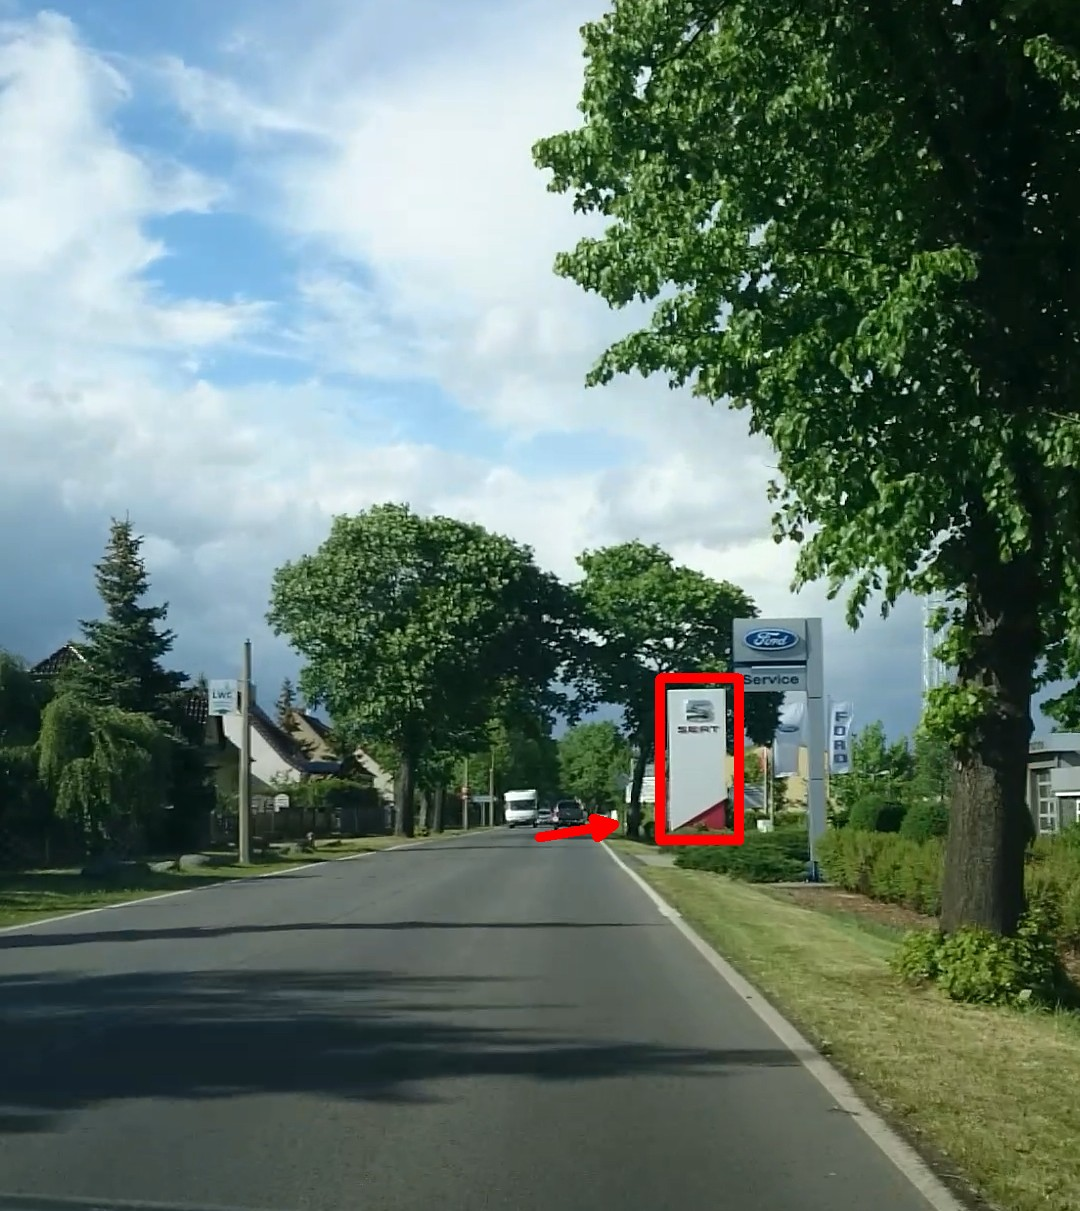 Anfahrt-2-1.jpg